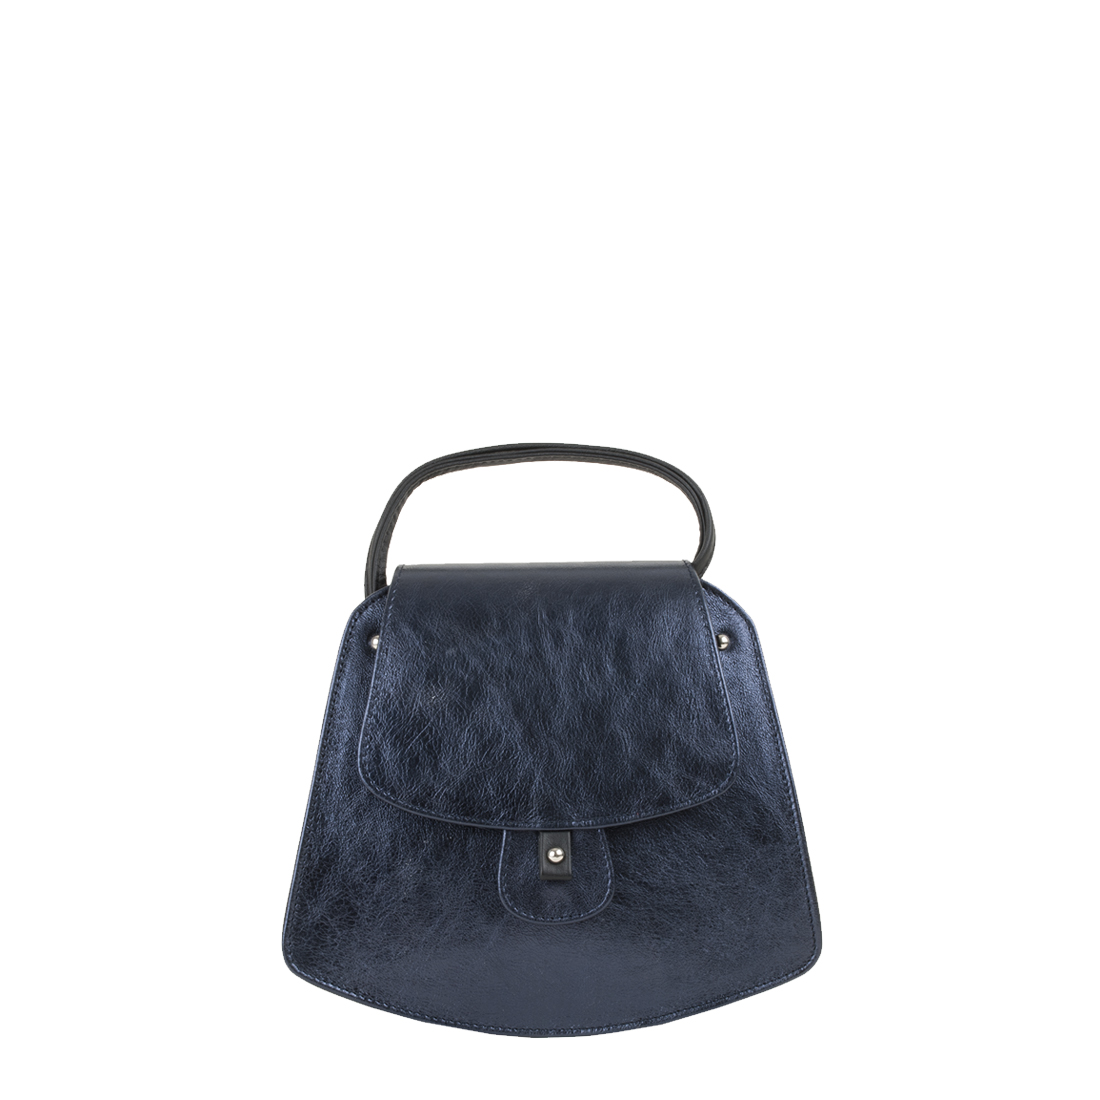 Clara Metallic Blue Leather Shoulder Bag